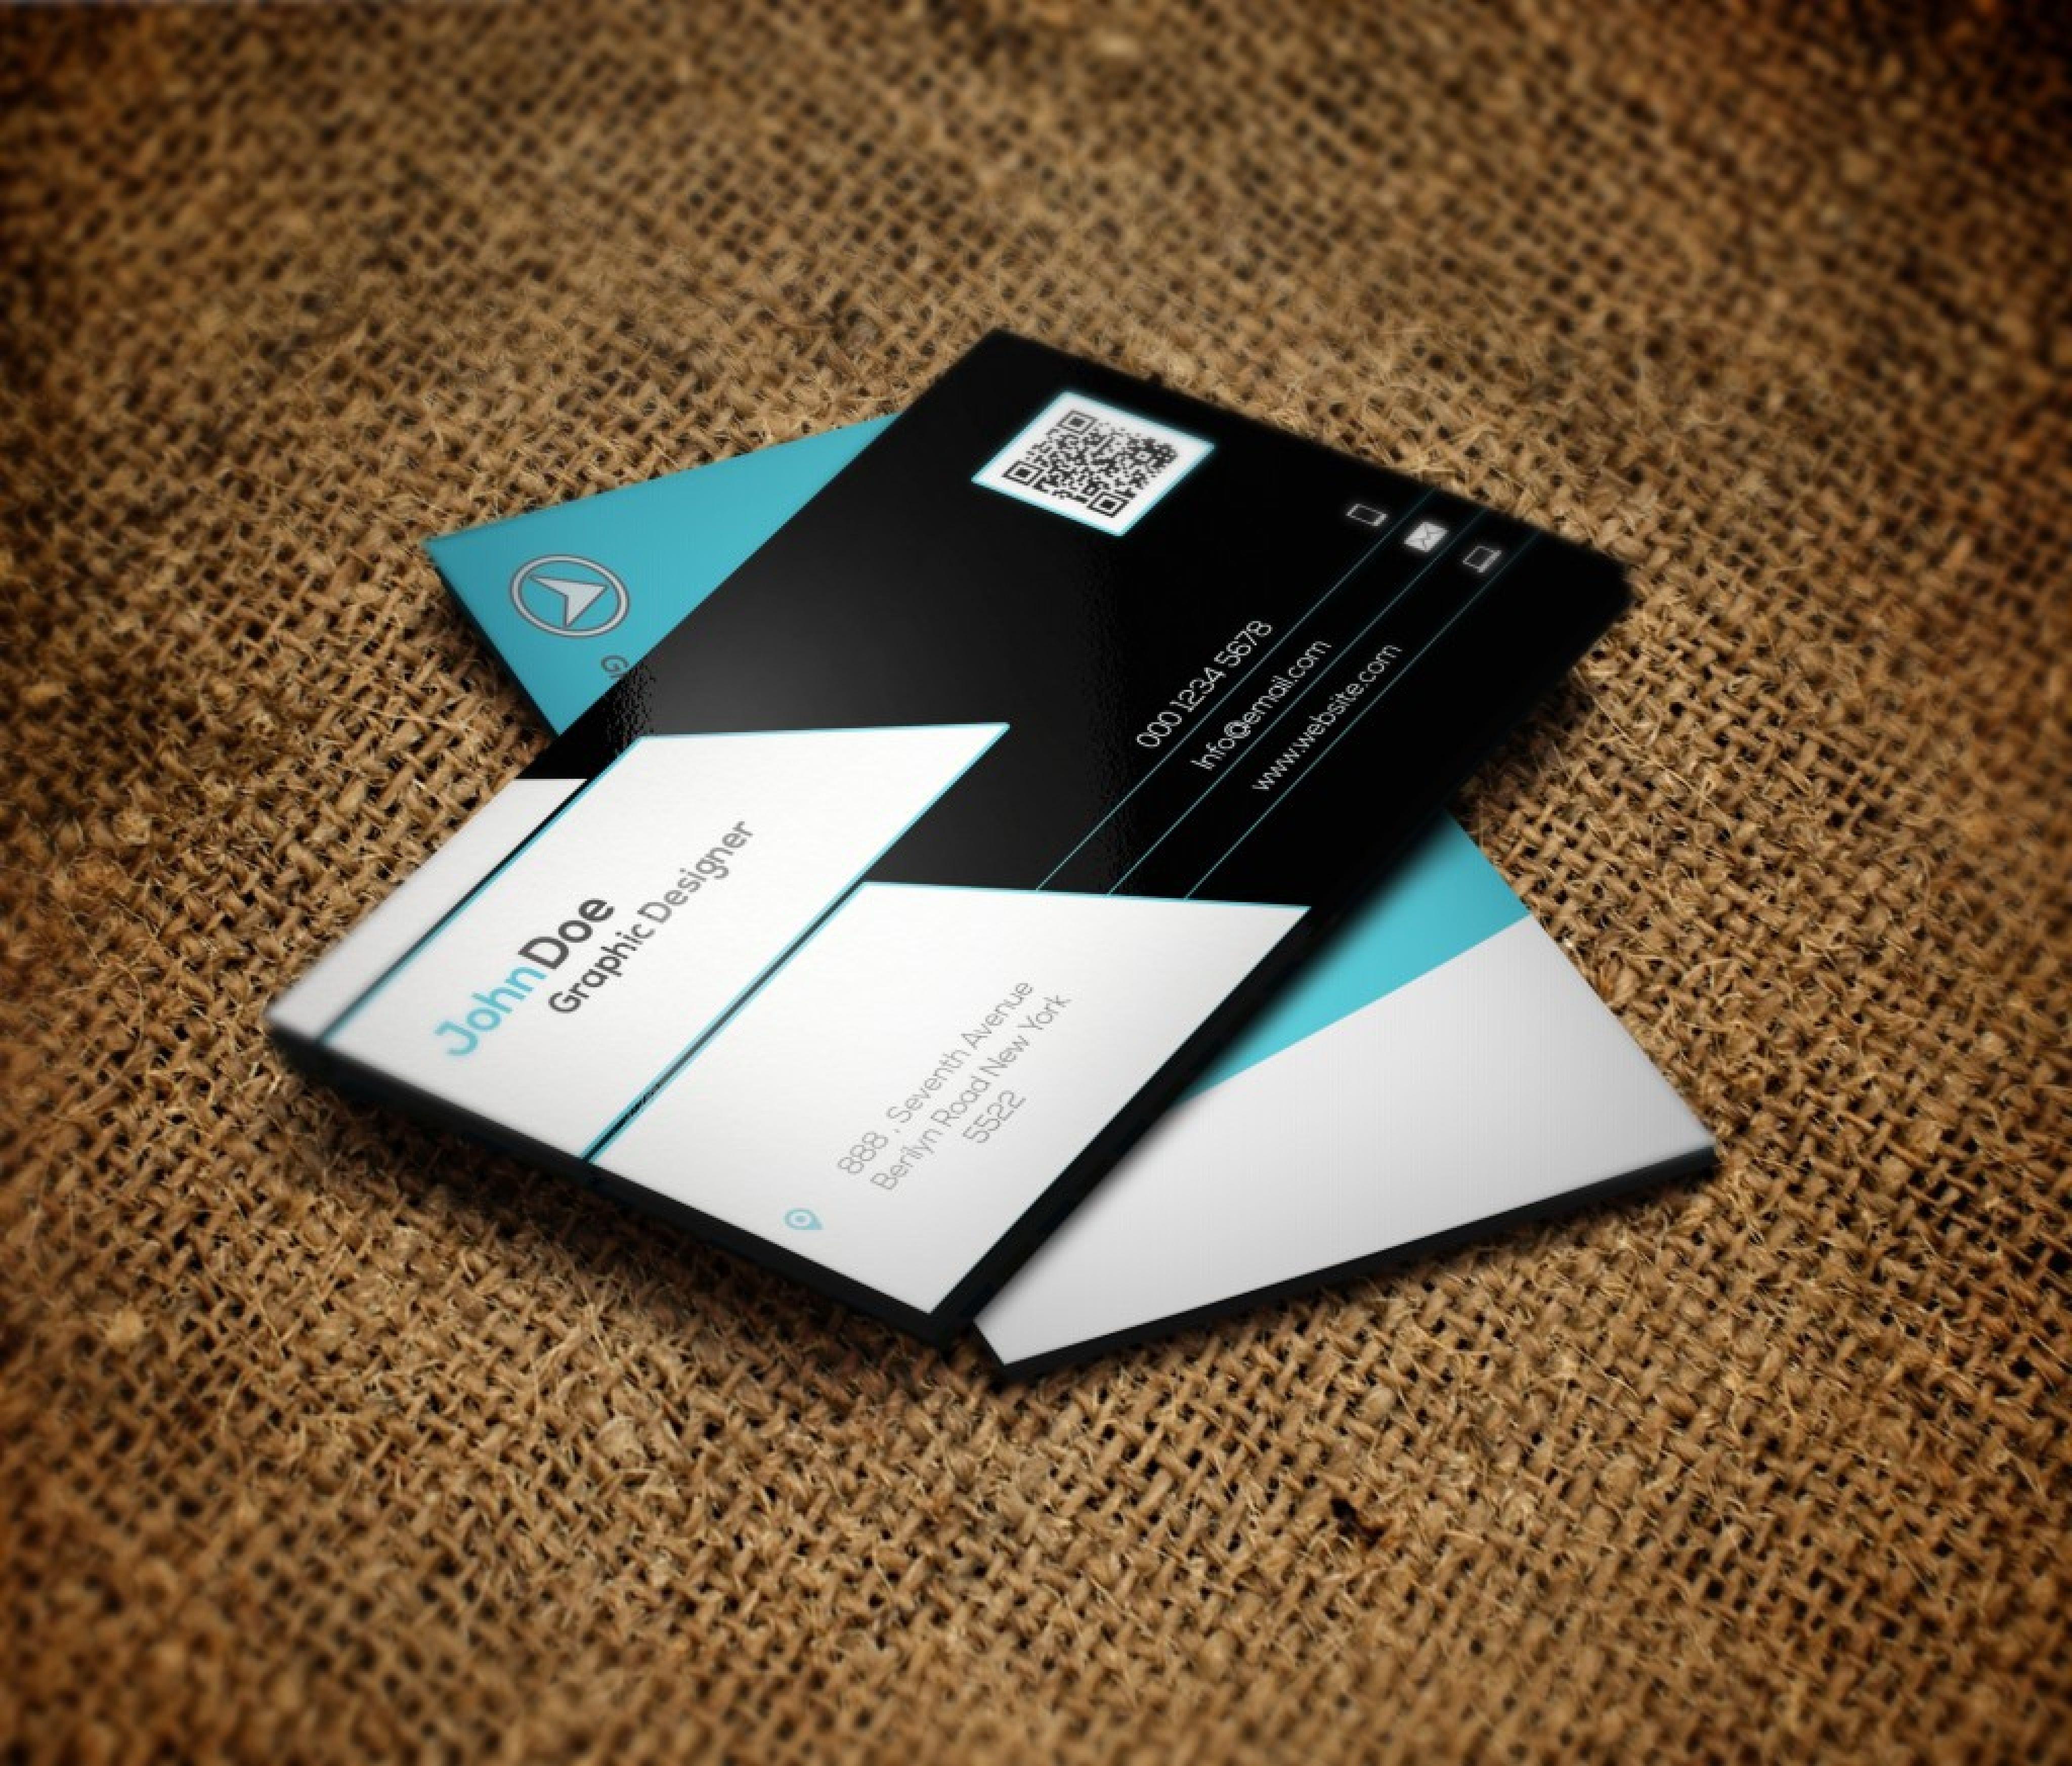 Business Card Design Ideas Template - favorite interior paint colors ...